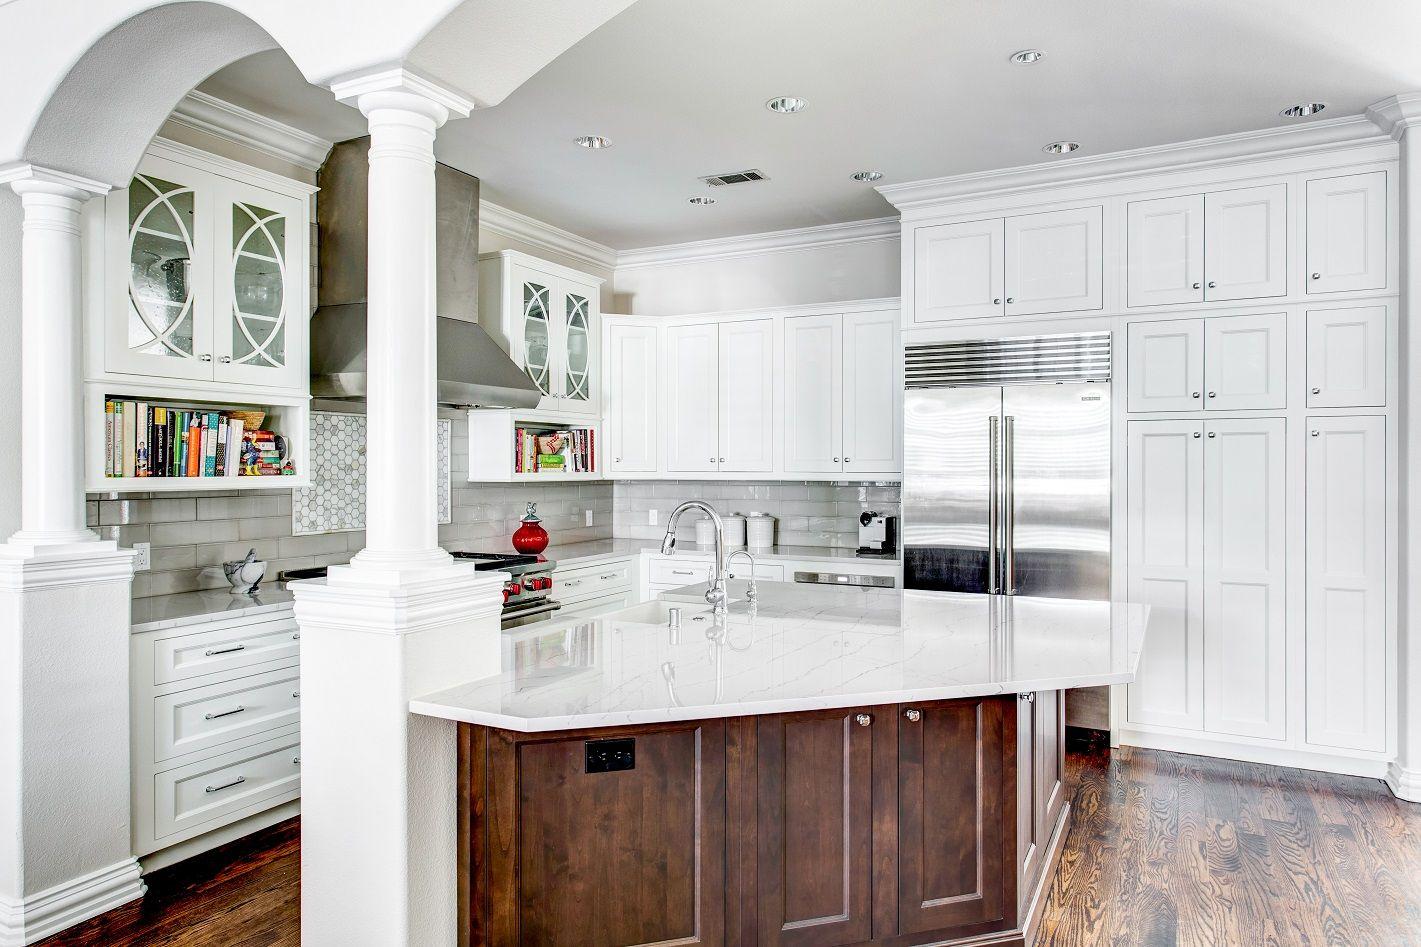 Kitchen Design Dallas Tx Prepossessing Kitchen Design And Redesign Archives  Kitchen Remodeling Decorating Design